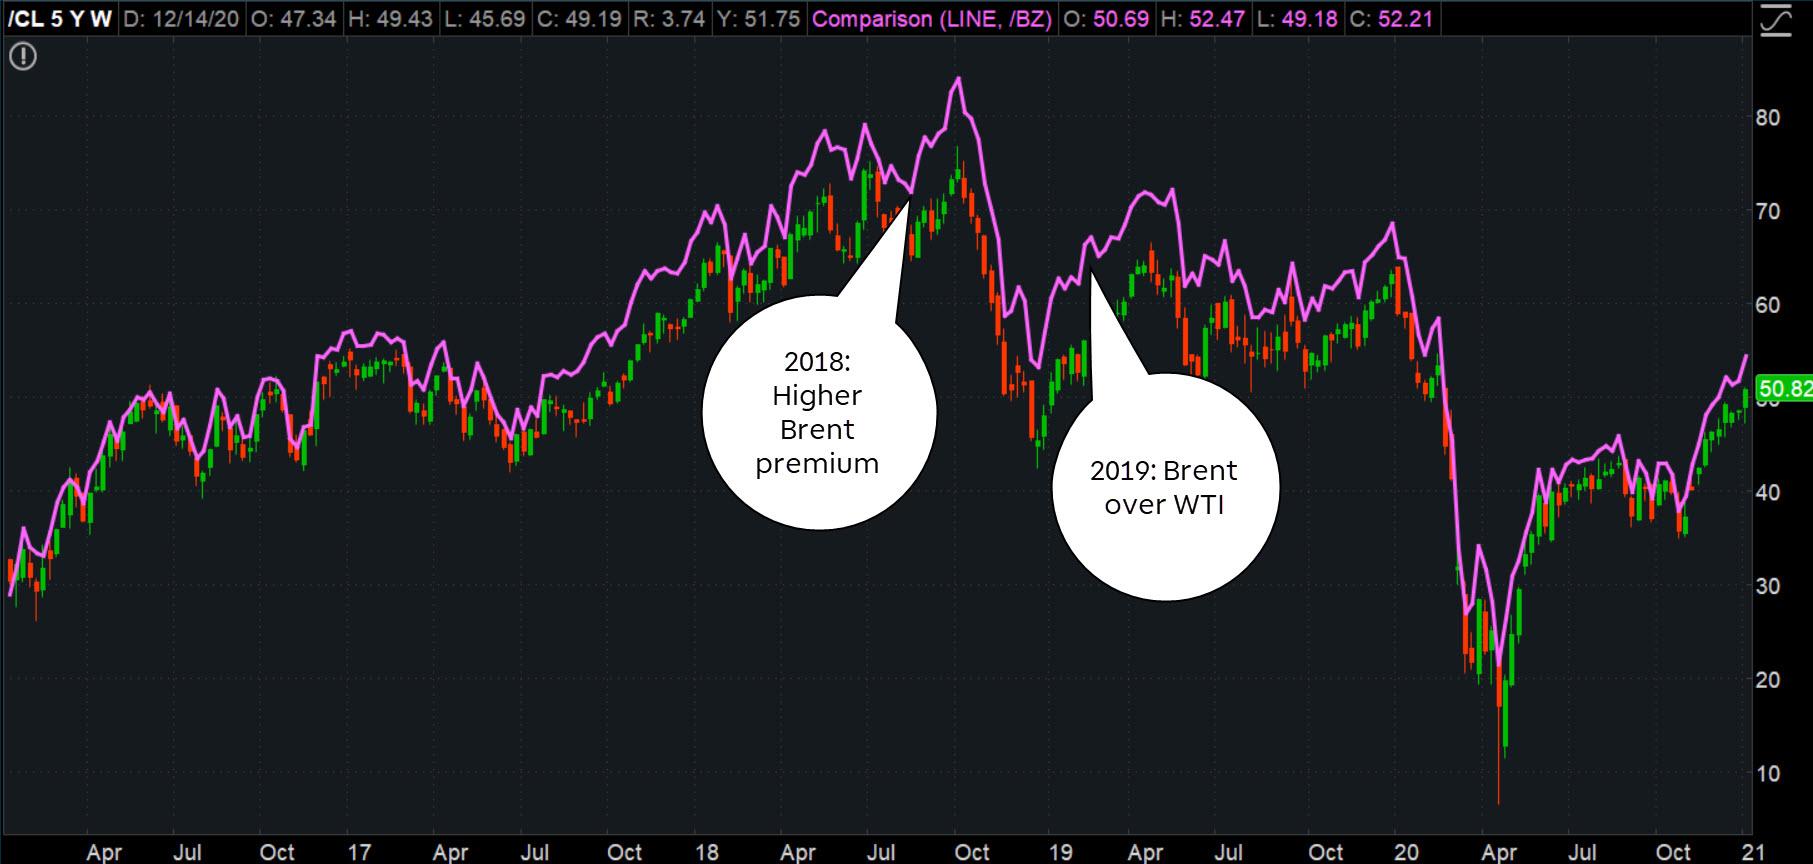 Brent and WTI comparison chart